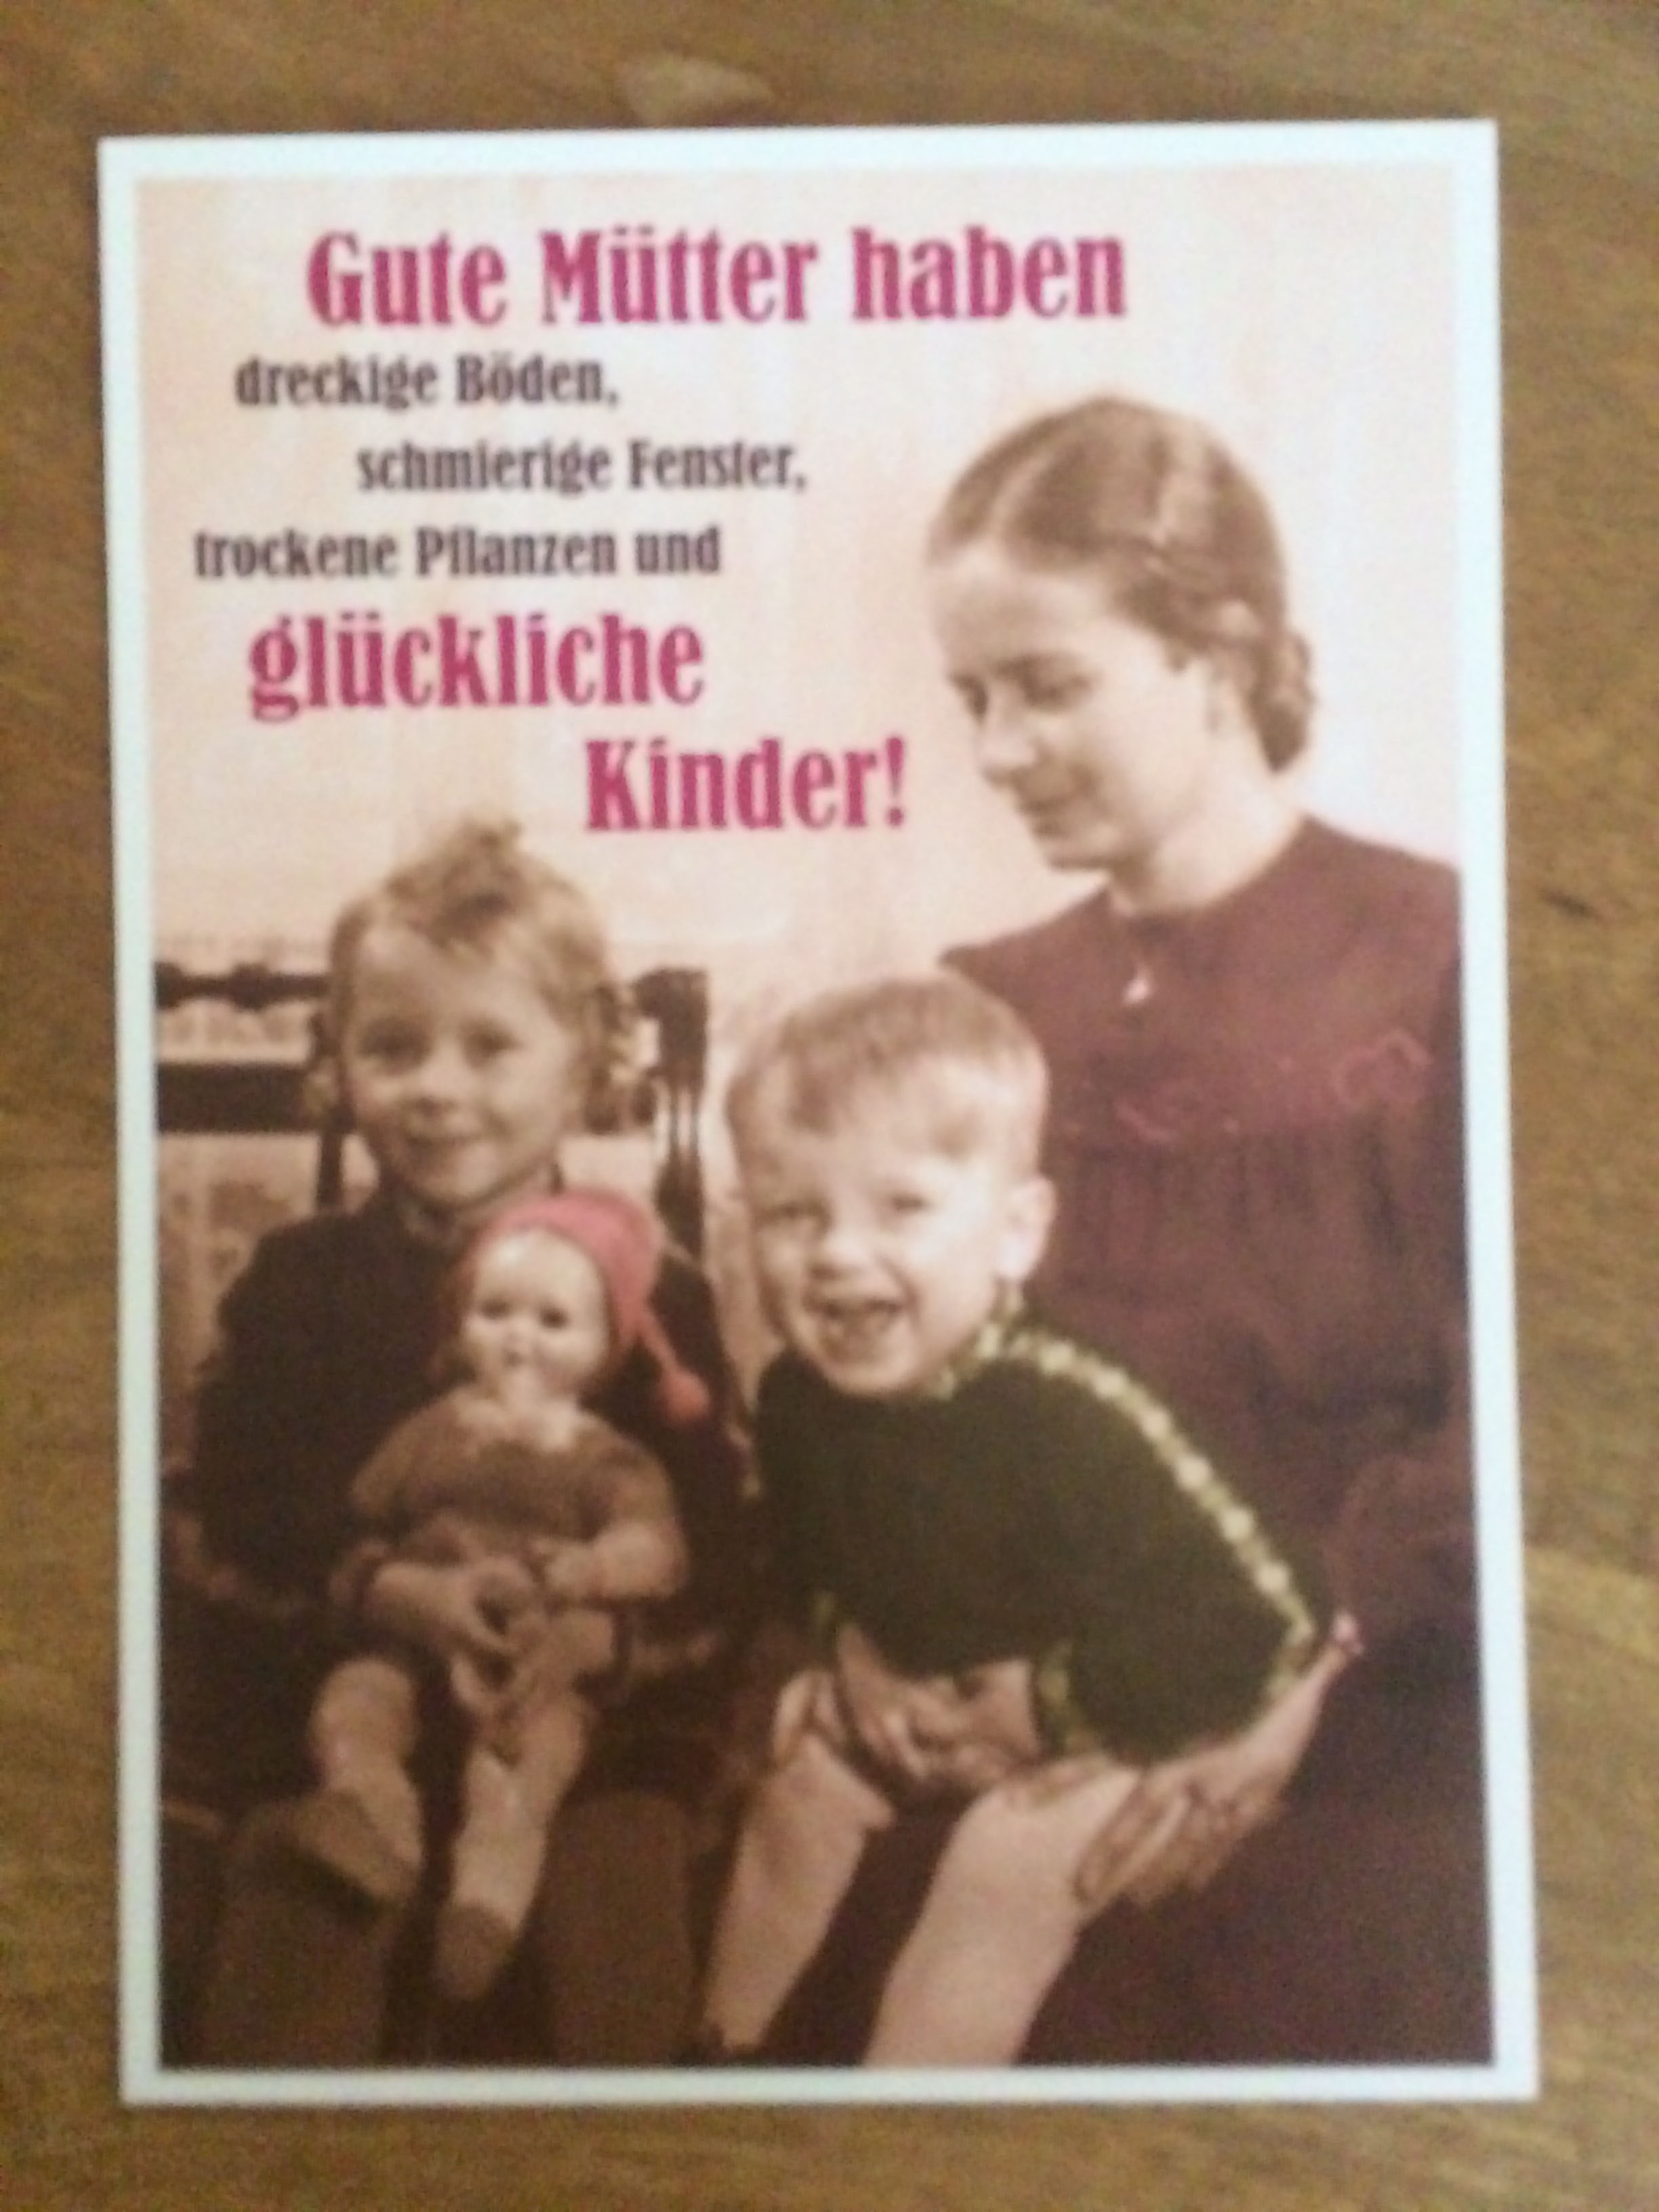 Postkarte Karte Gute Mütter haben dreckige Böden schmierige Fenster.... Paloma